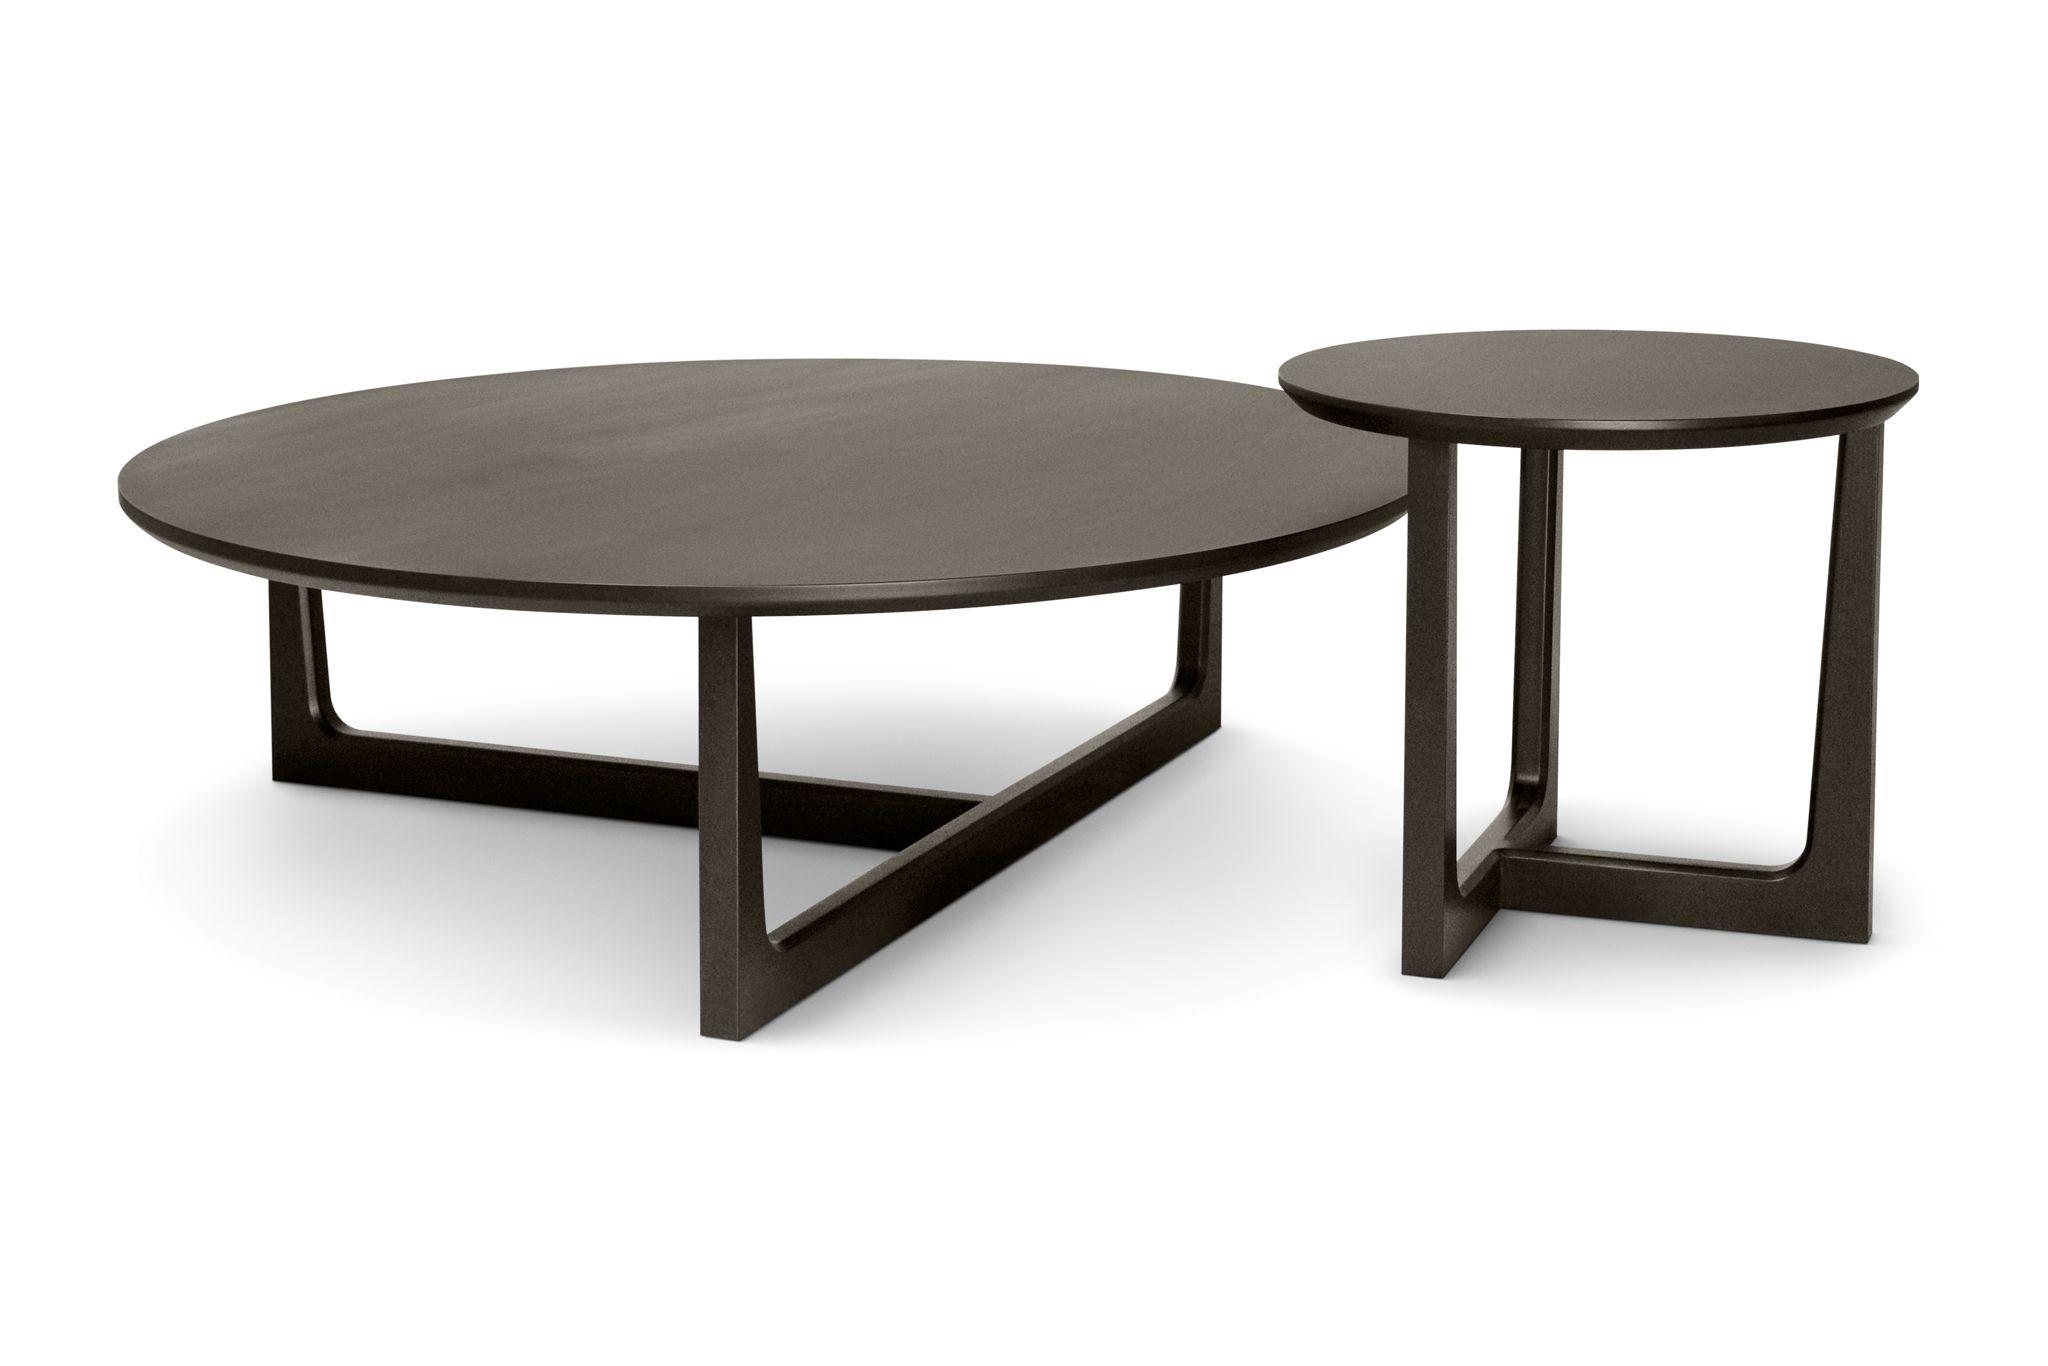 Pleasing Pin By Kk Gin On Ffe Sofa Daybed Pinterest Furniture Interior Design Ideas Philsoteloinfo